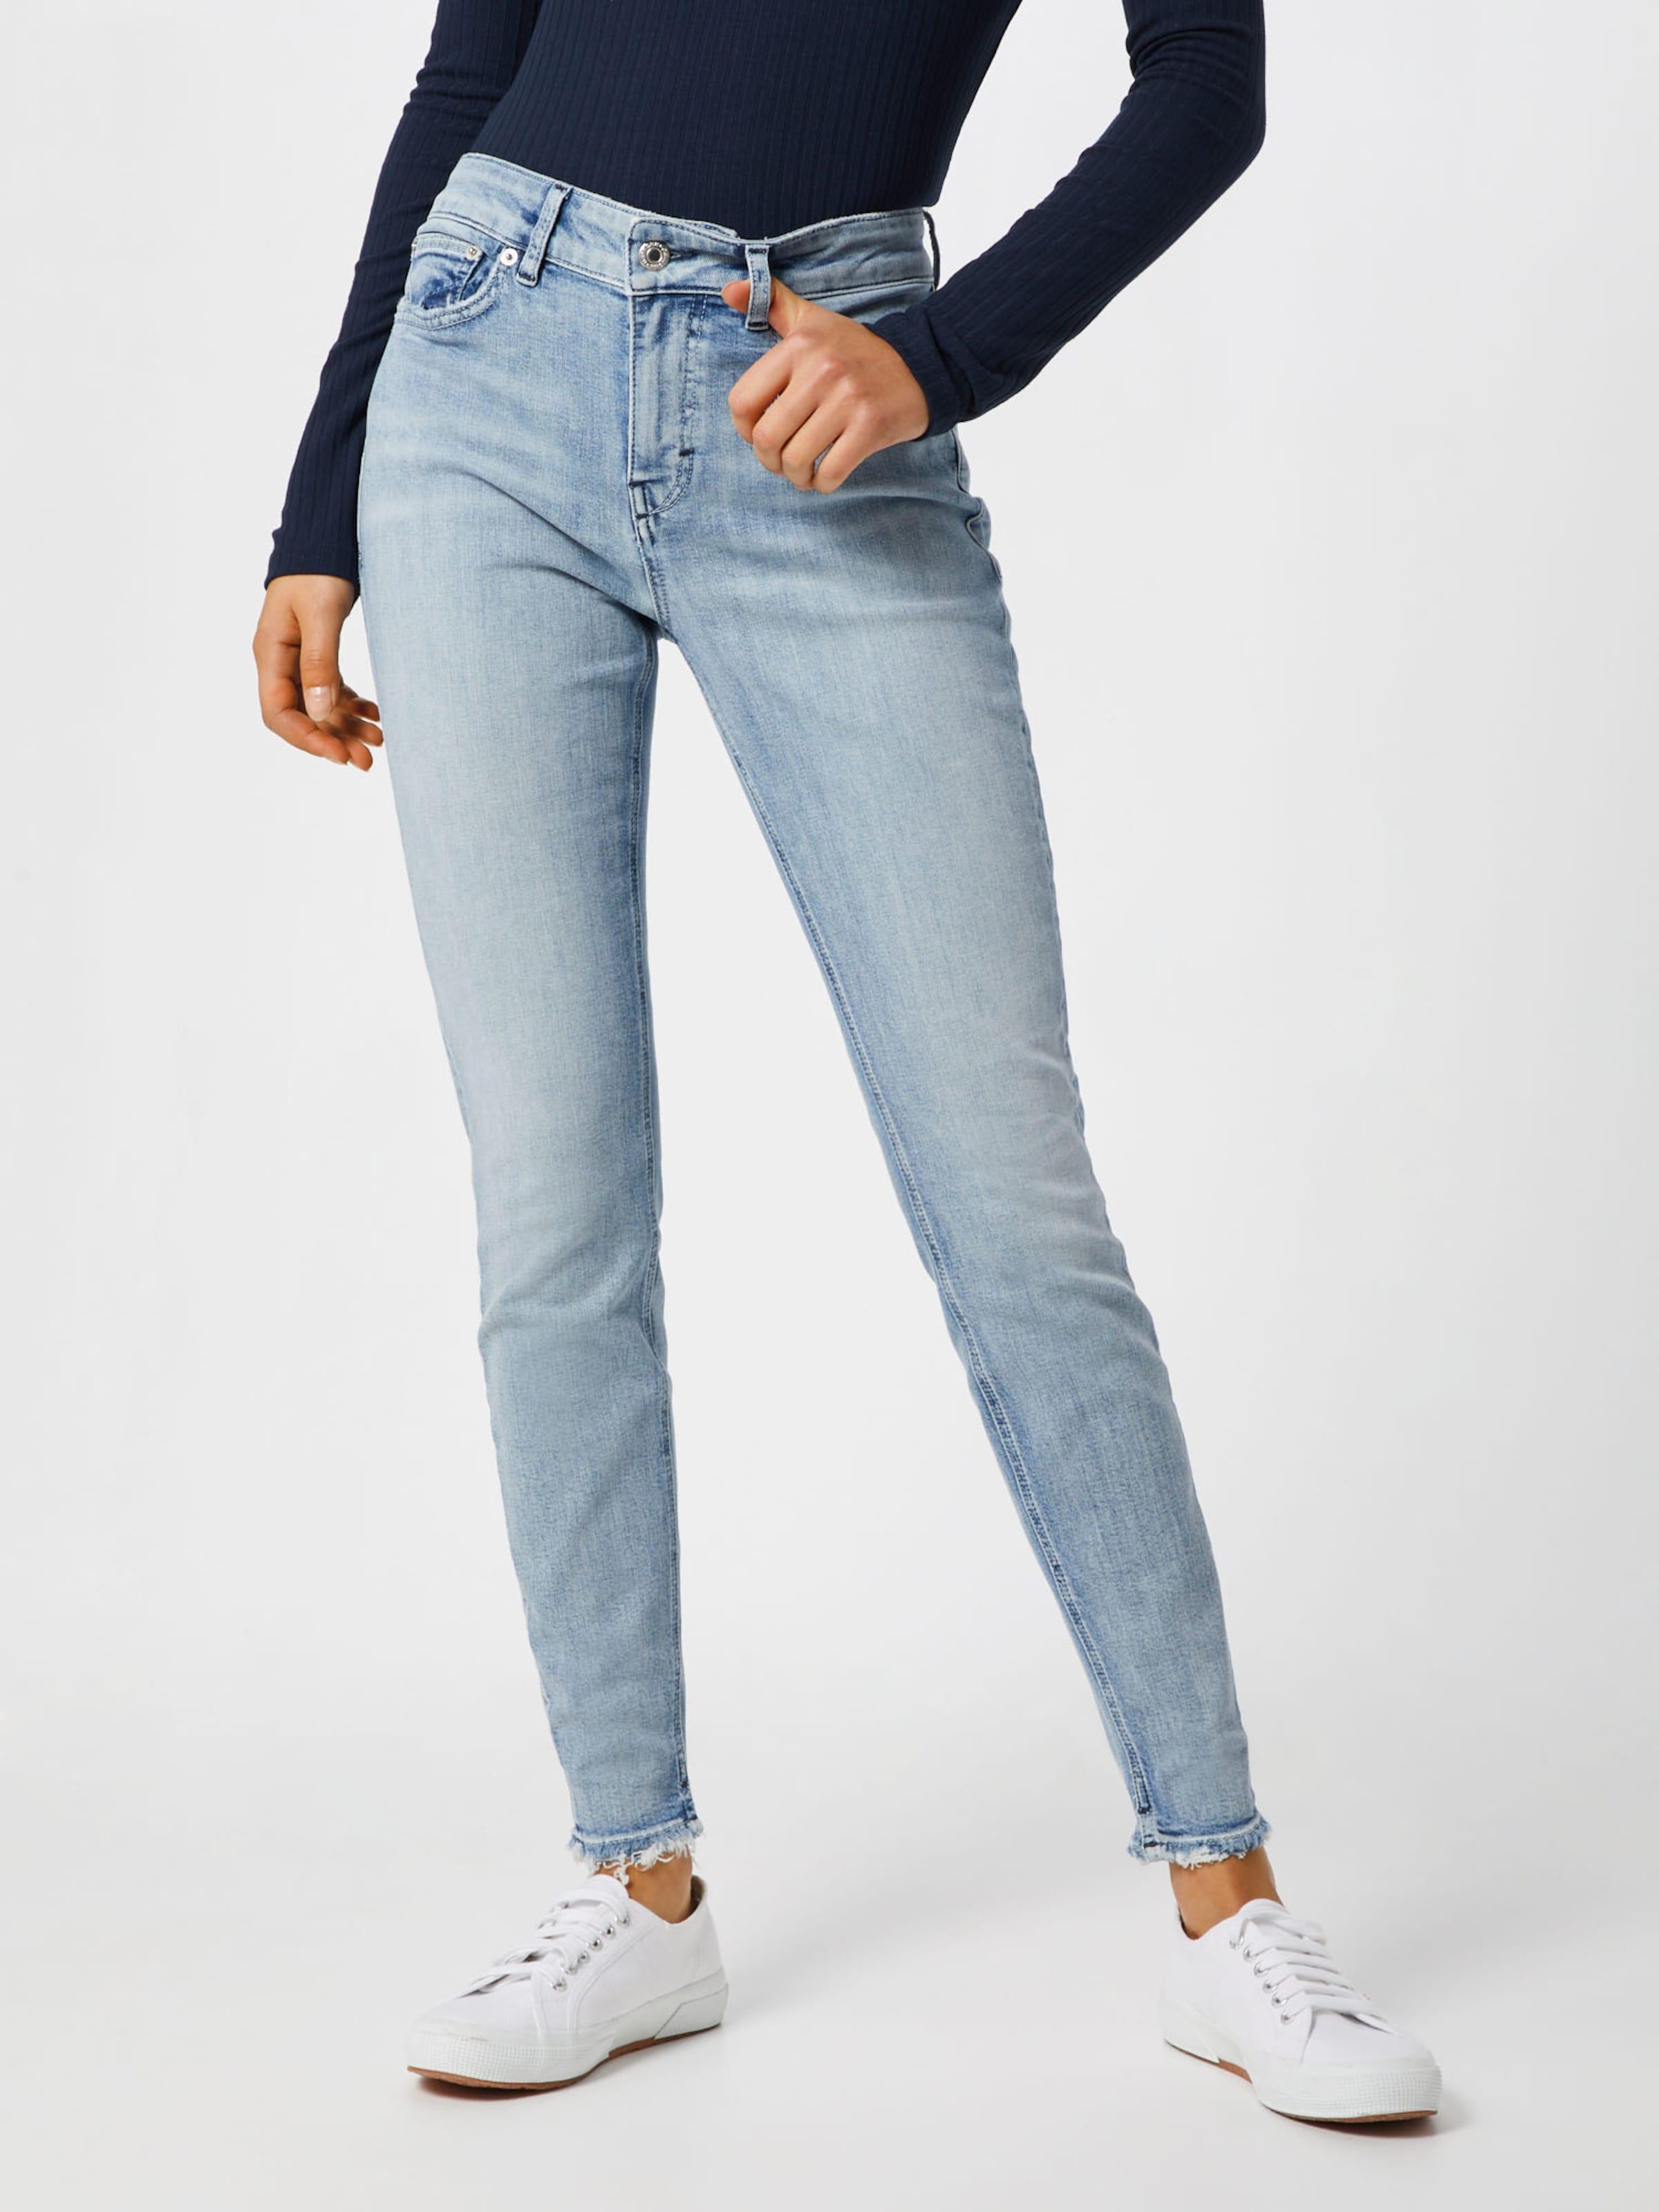 In 'need' Denim Jeanshose Blue Drykorn wON8ymvn0P